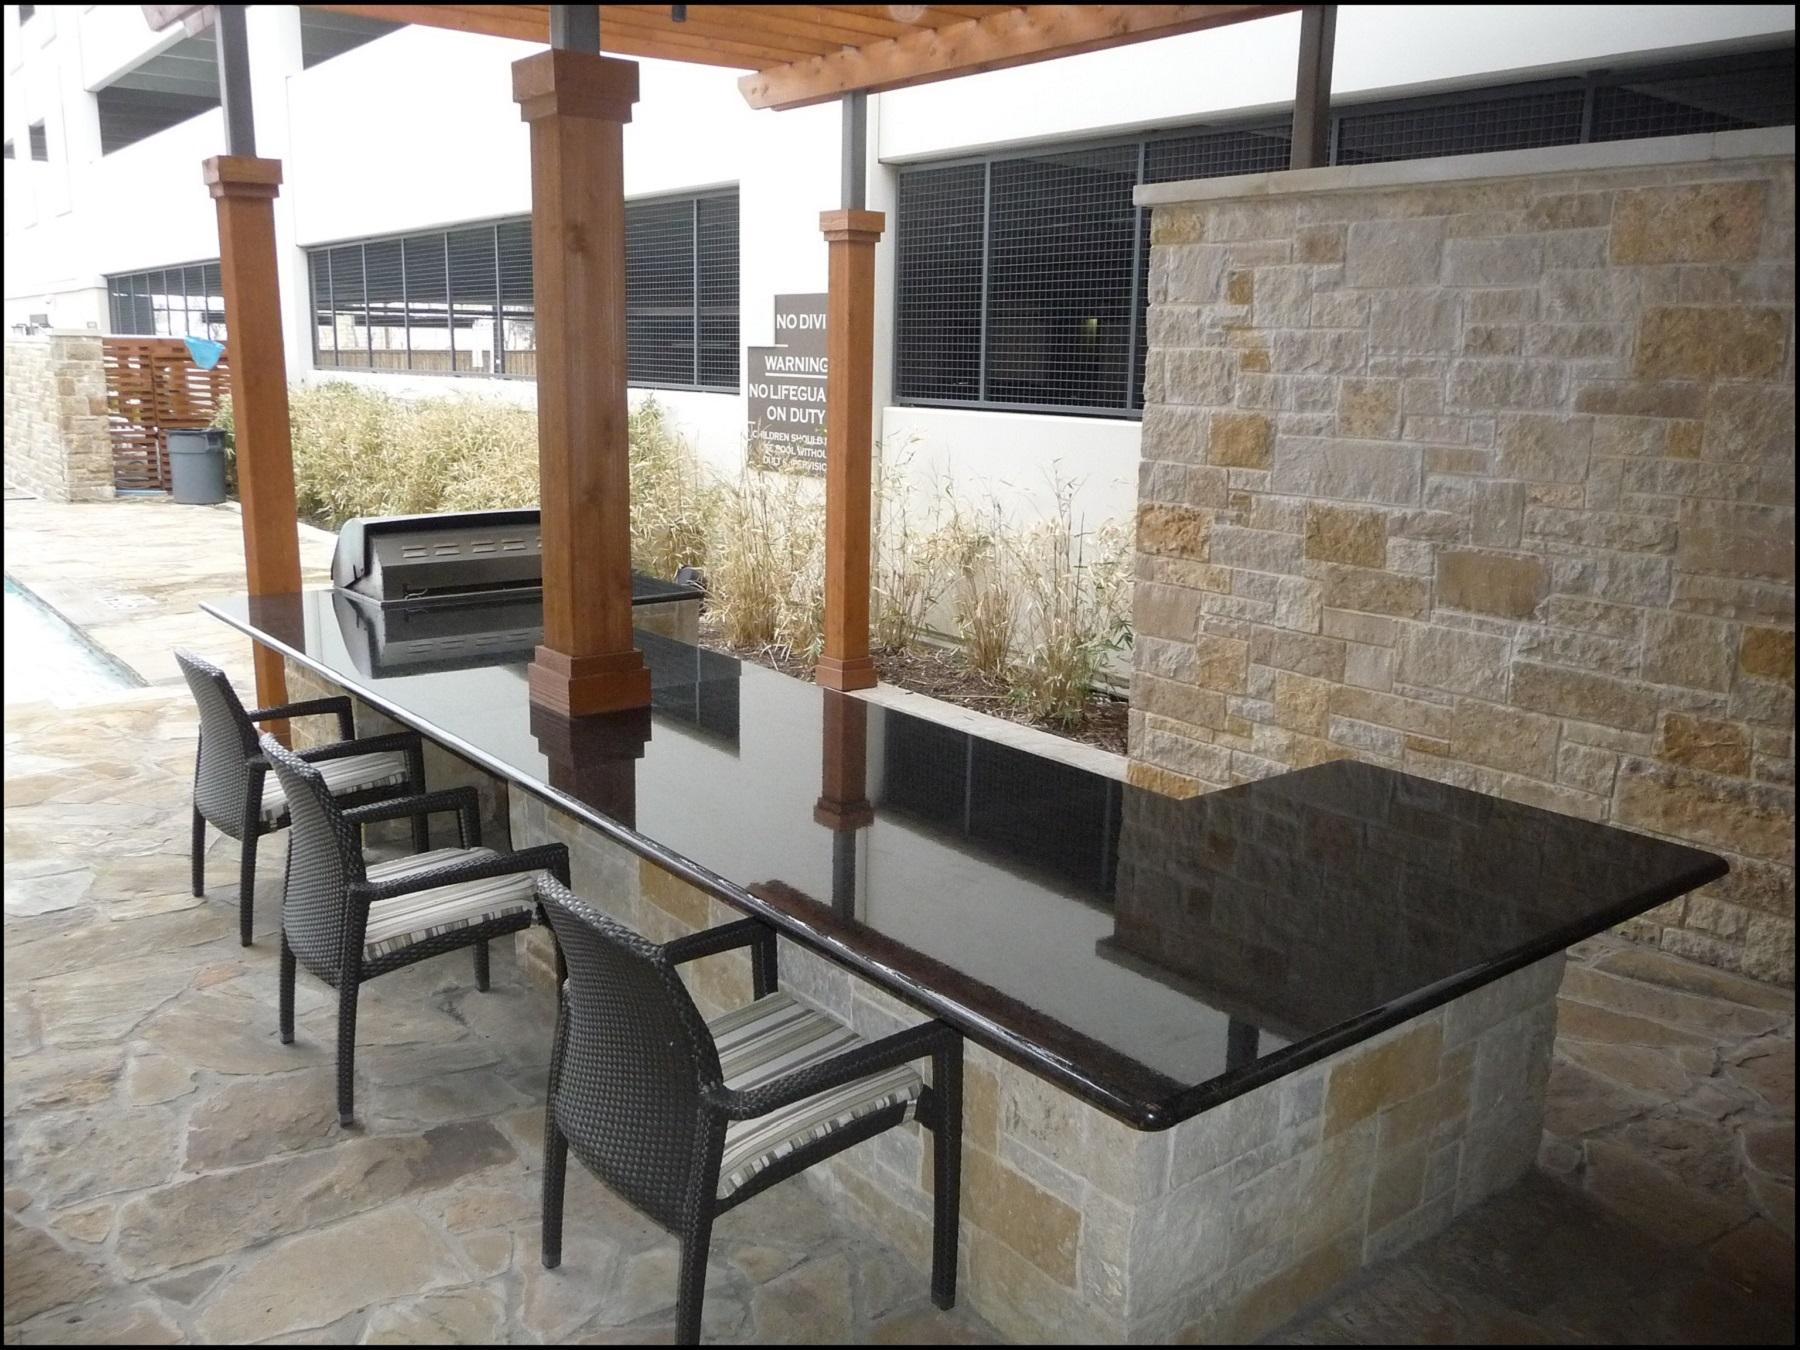 Outdoor Kitchen Countertops Granite Quartz Quartzite Countertops Dallas Fort Worth Texas Tx By Dfw Granite Kitchens Baths Fabrication Installation